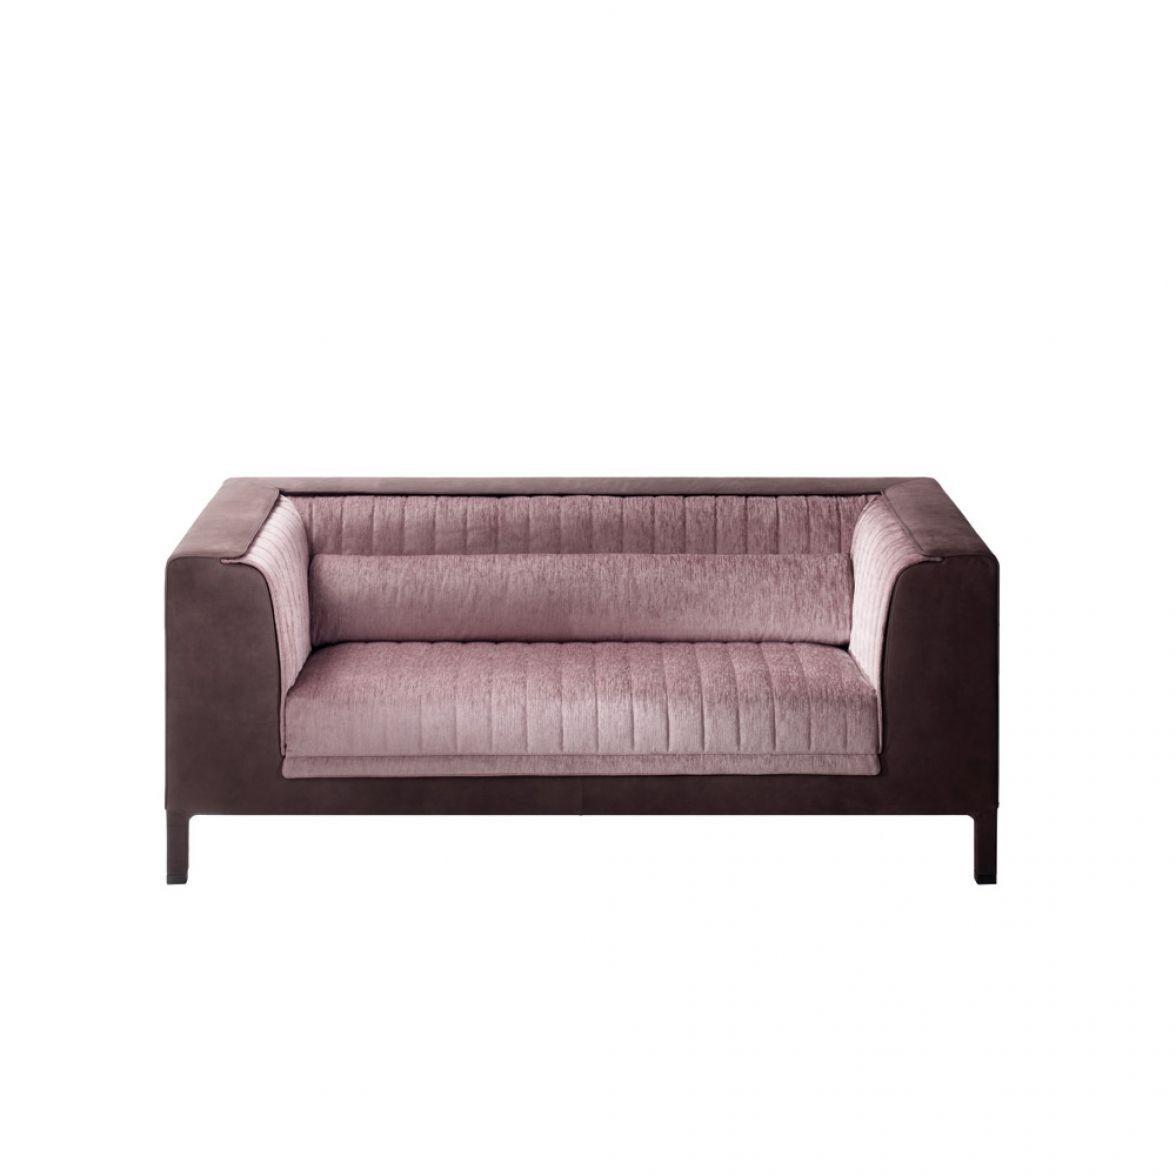 Kalo sofa